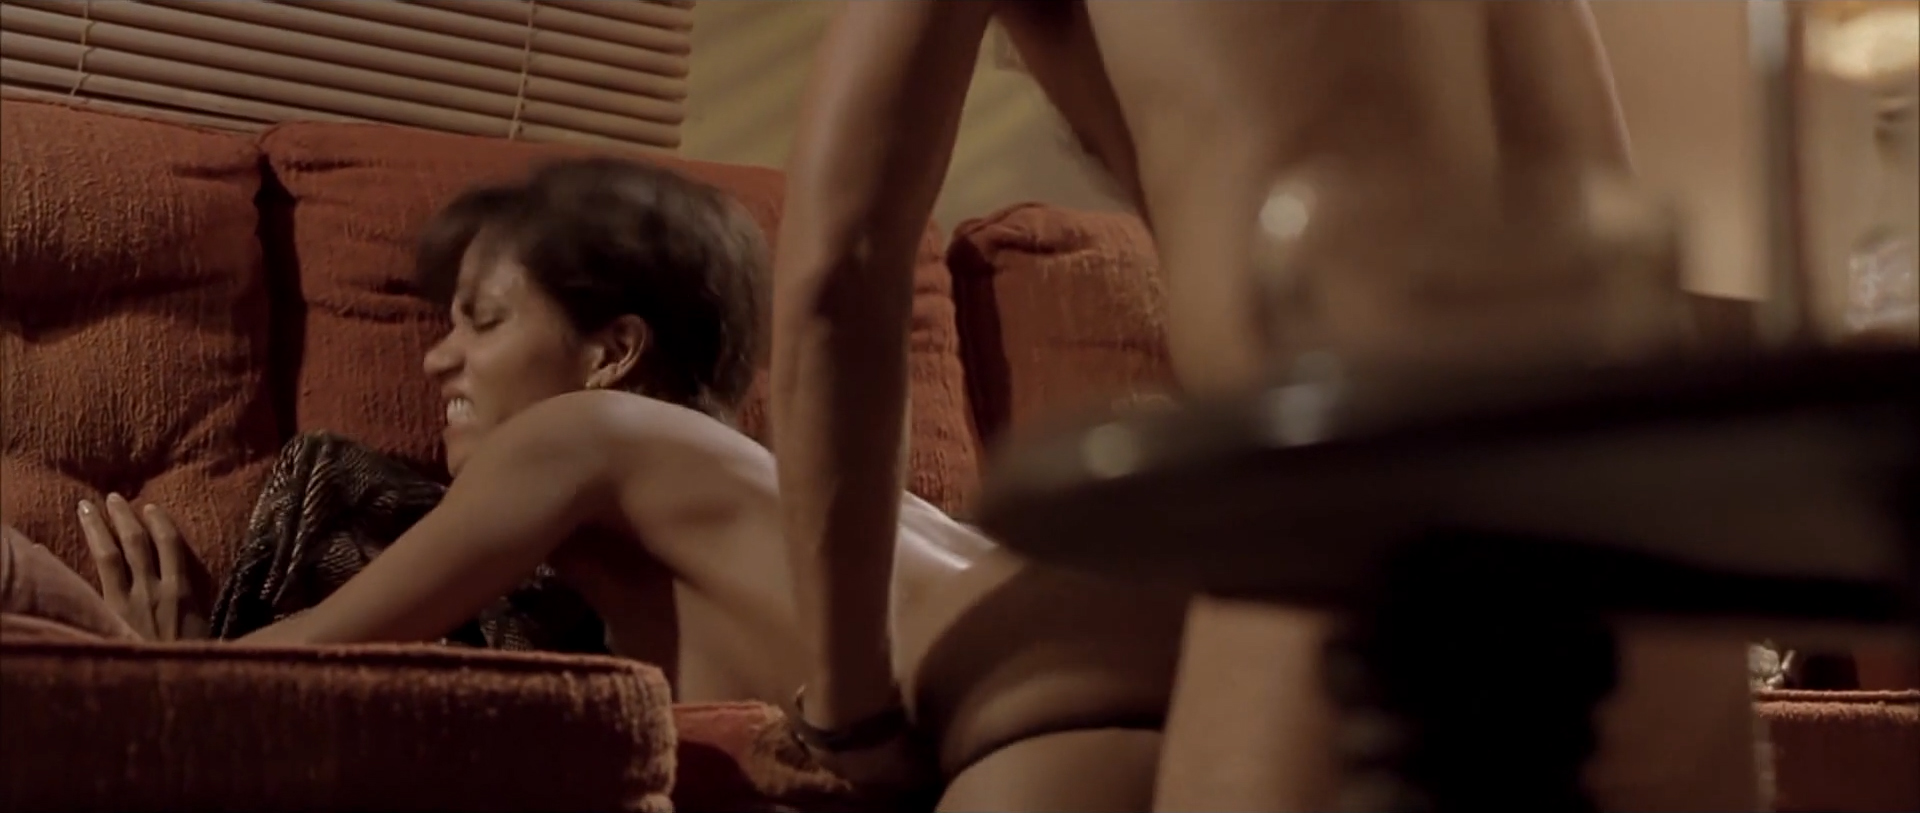 Halle berry sex scenes monster s ball